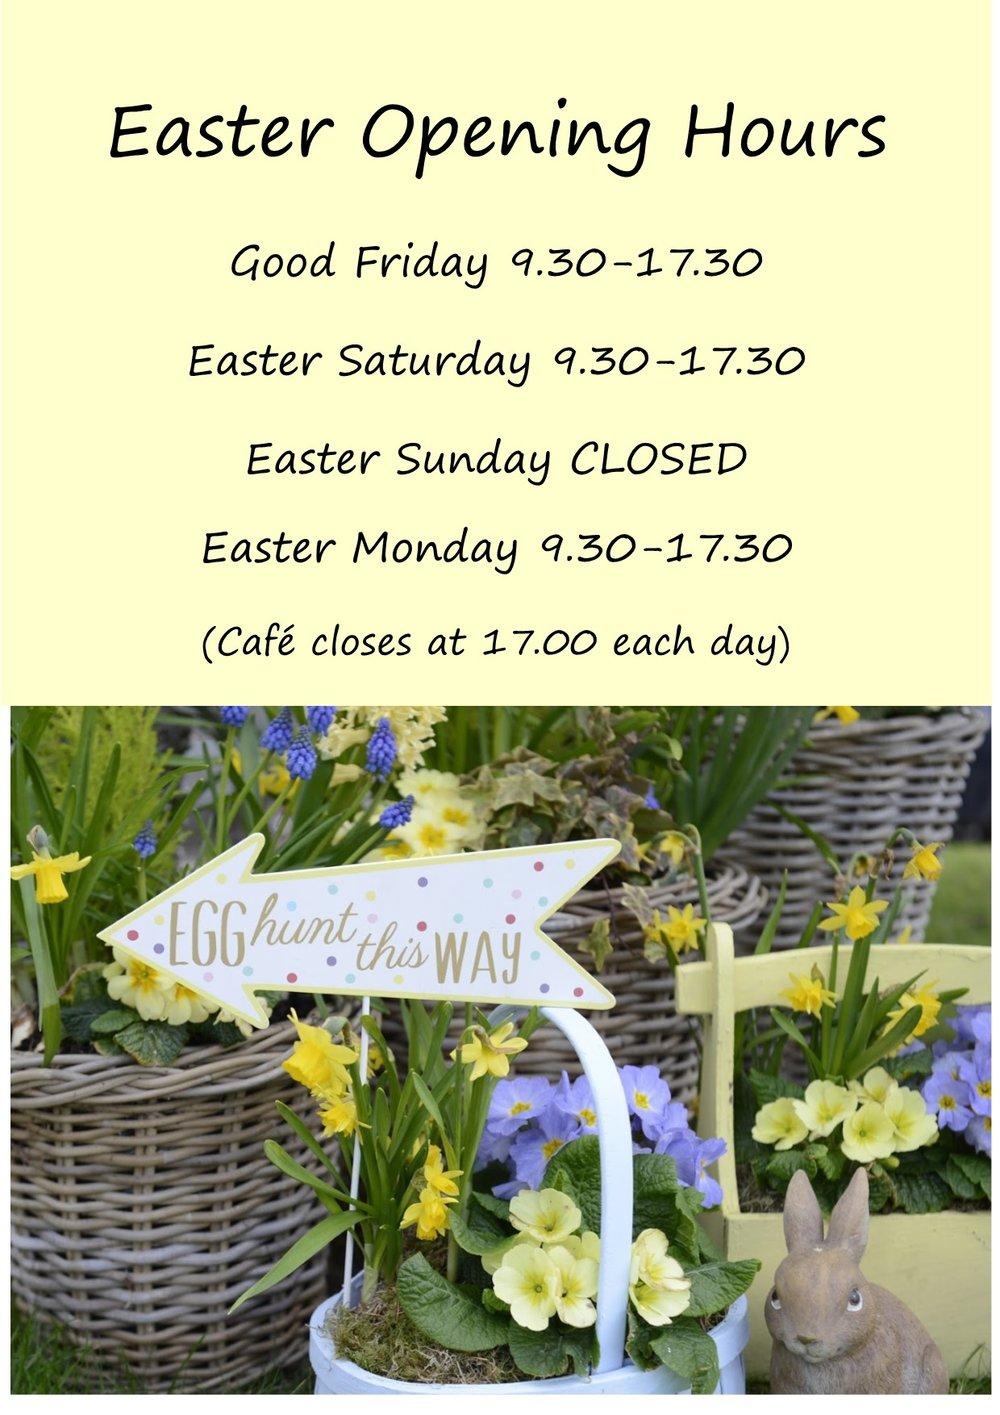 Easter Opening Hours.jpg